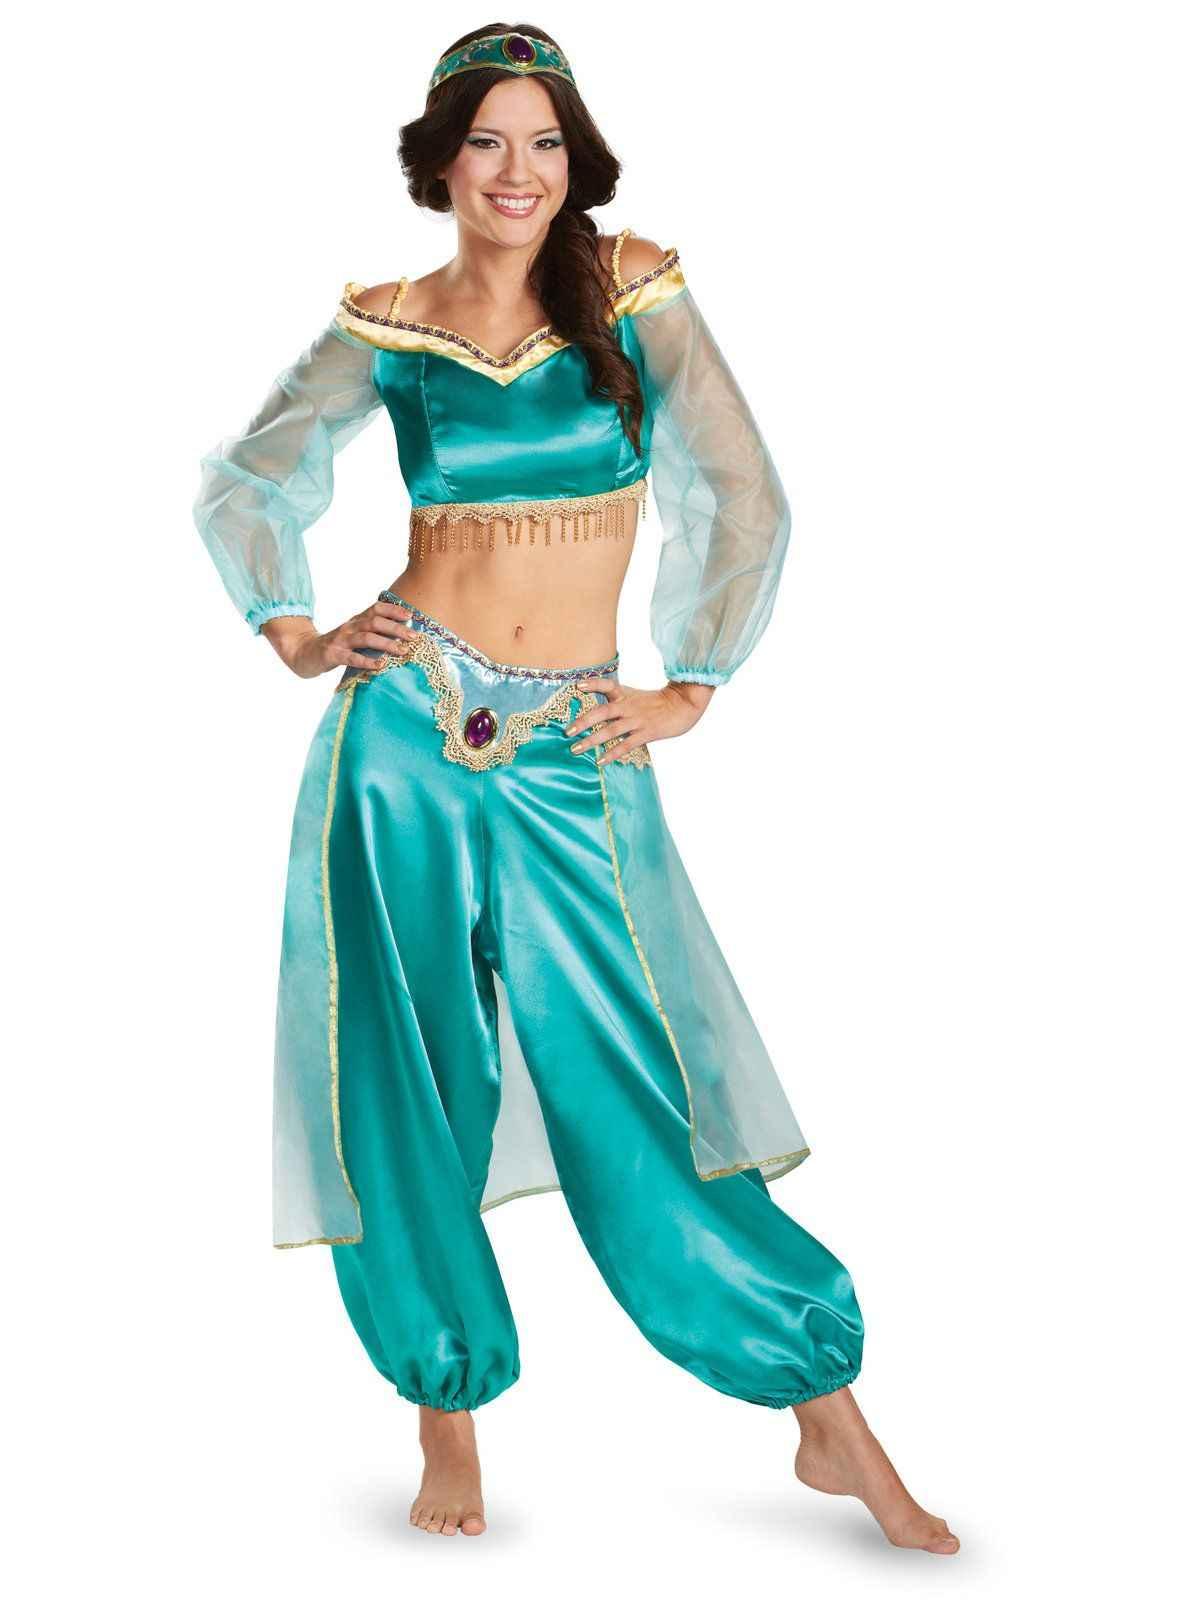 eb11a96424ed Adult Aladdin Princess Genie Jasmine Prestige Costume Arabian Belly Dance  Fancy Dress